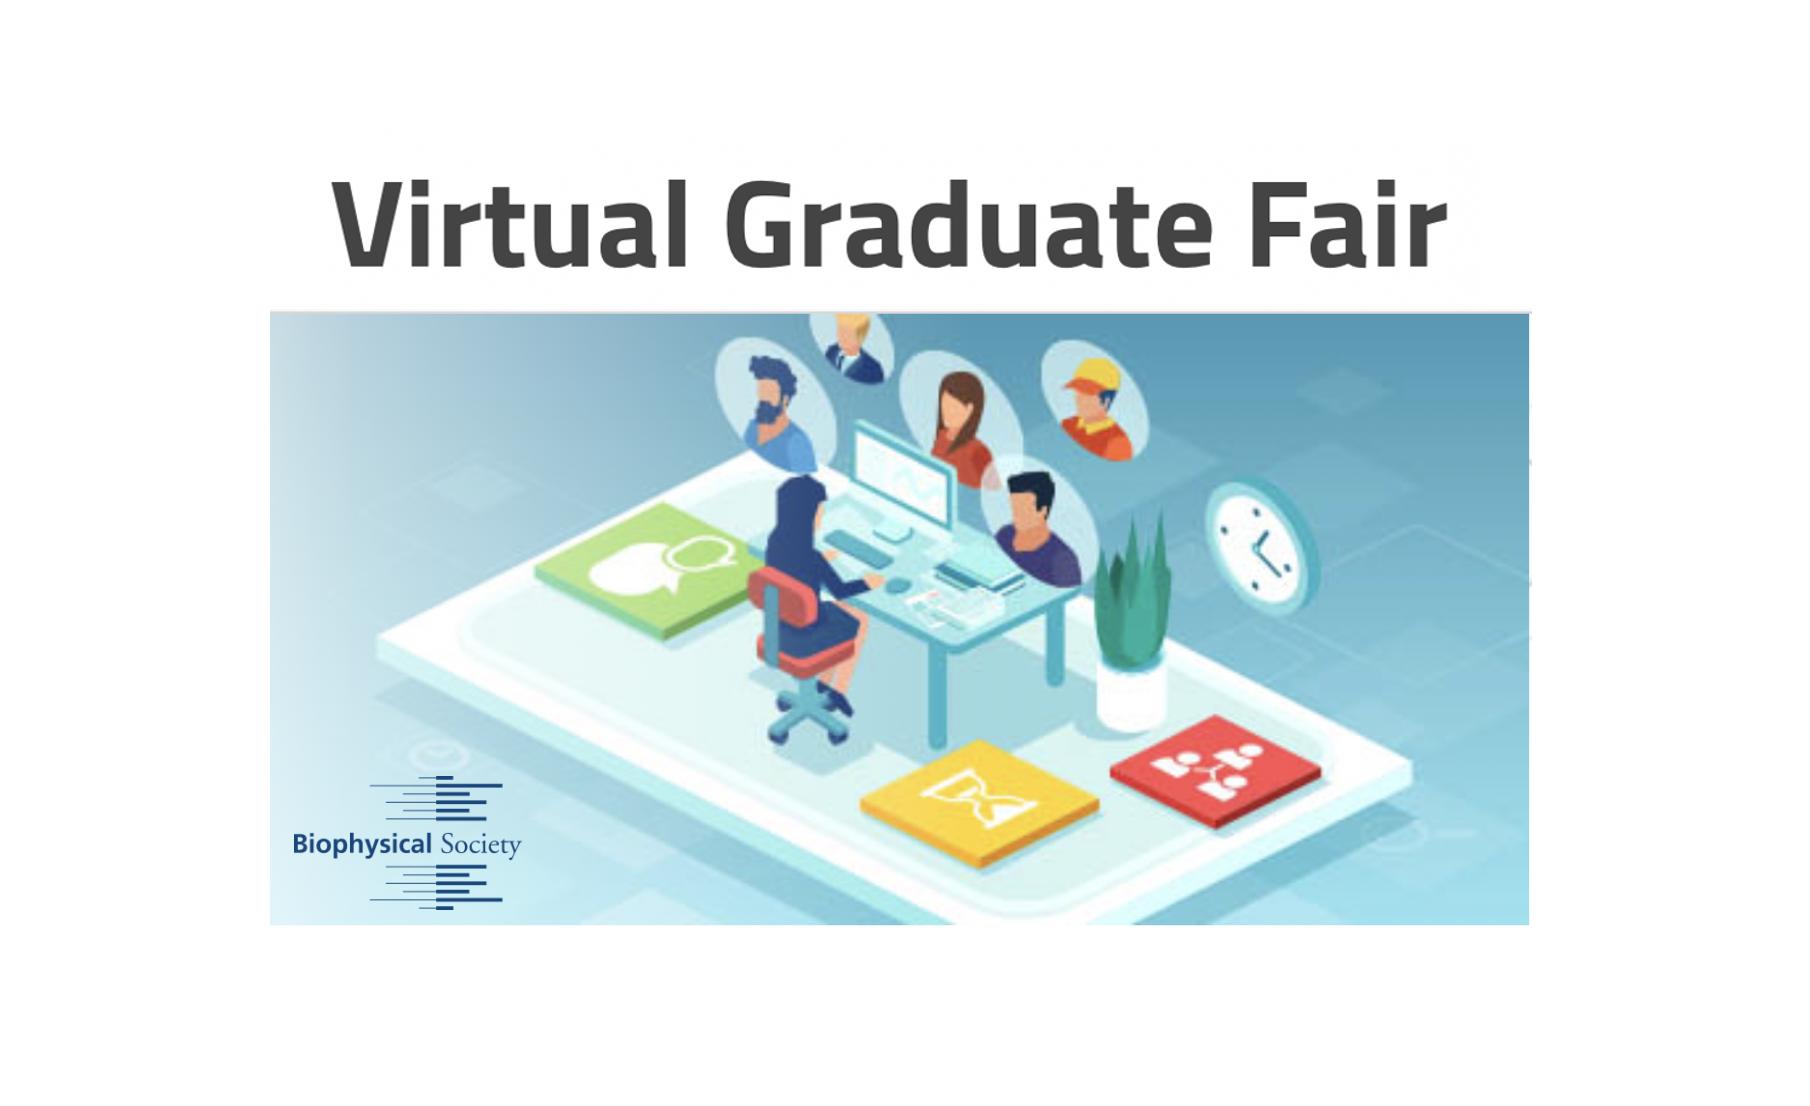 Free virtual graduate fair held by the Biophysical Society (Nov 11/12, 2021)